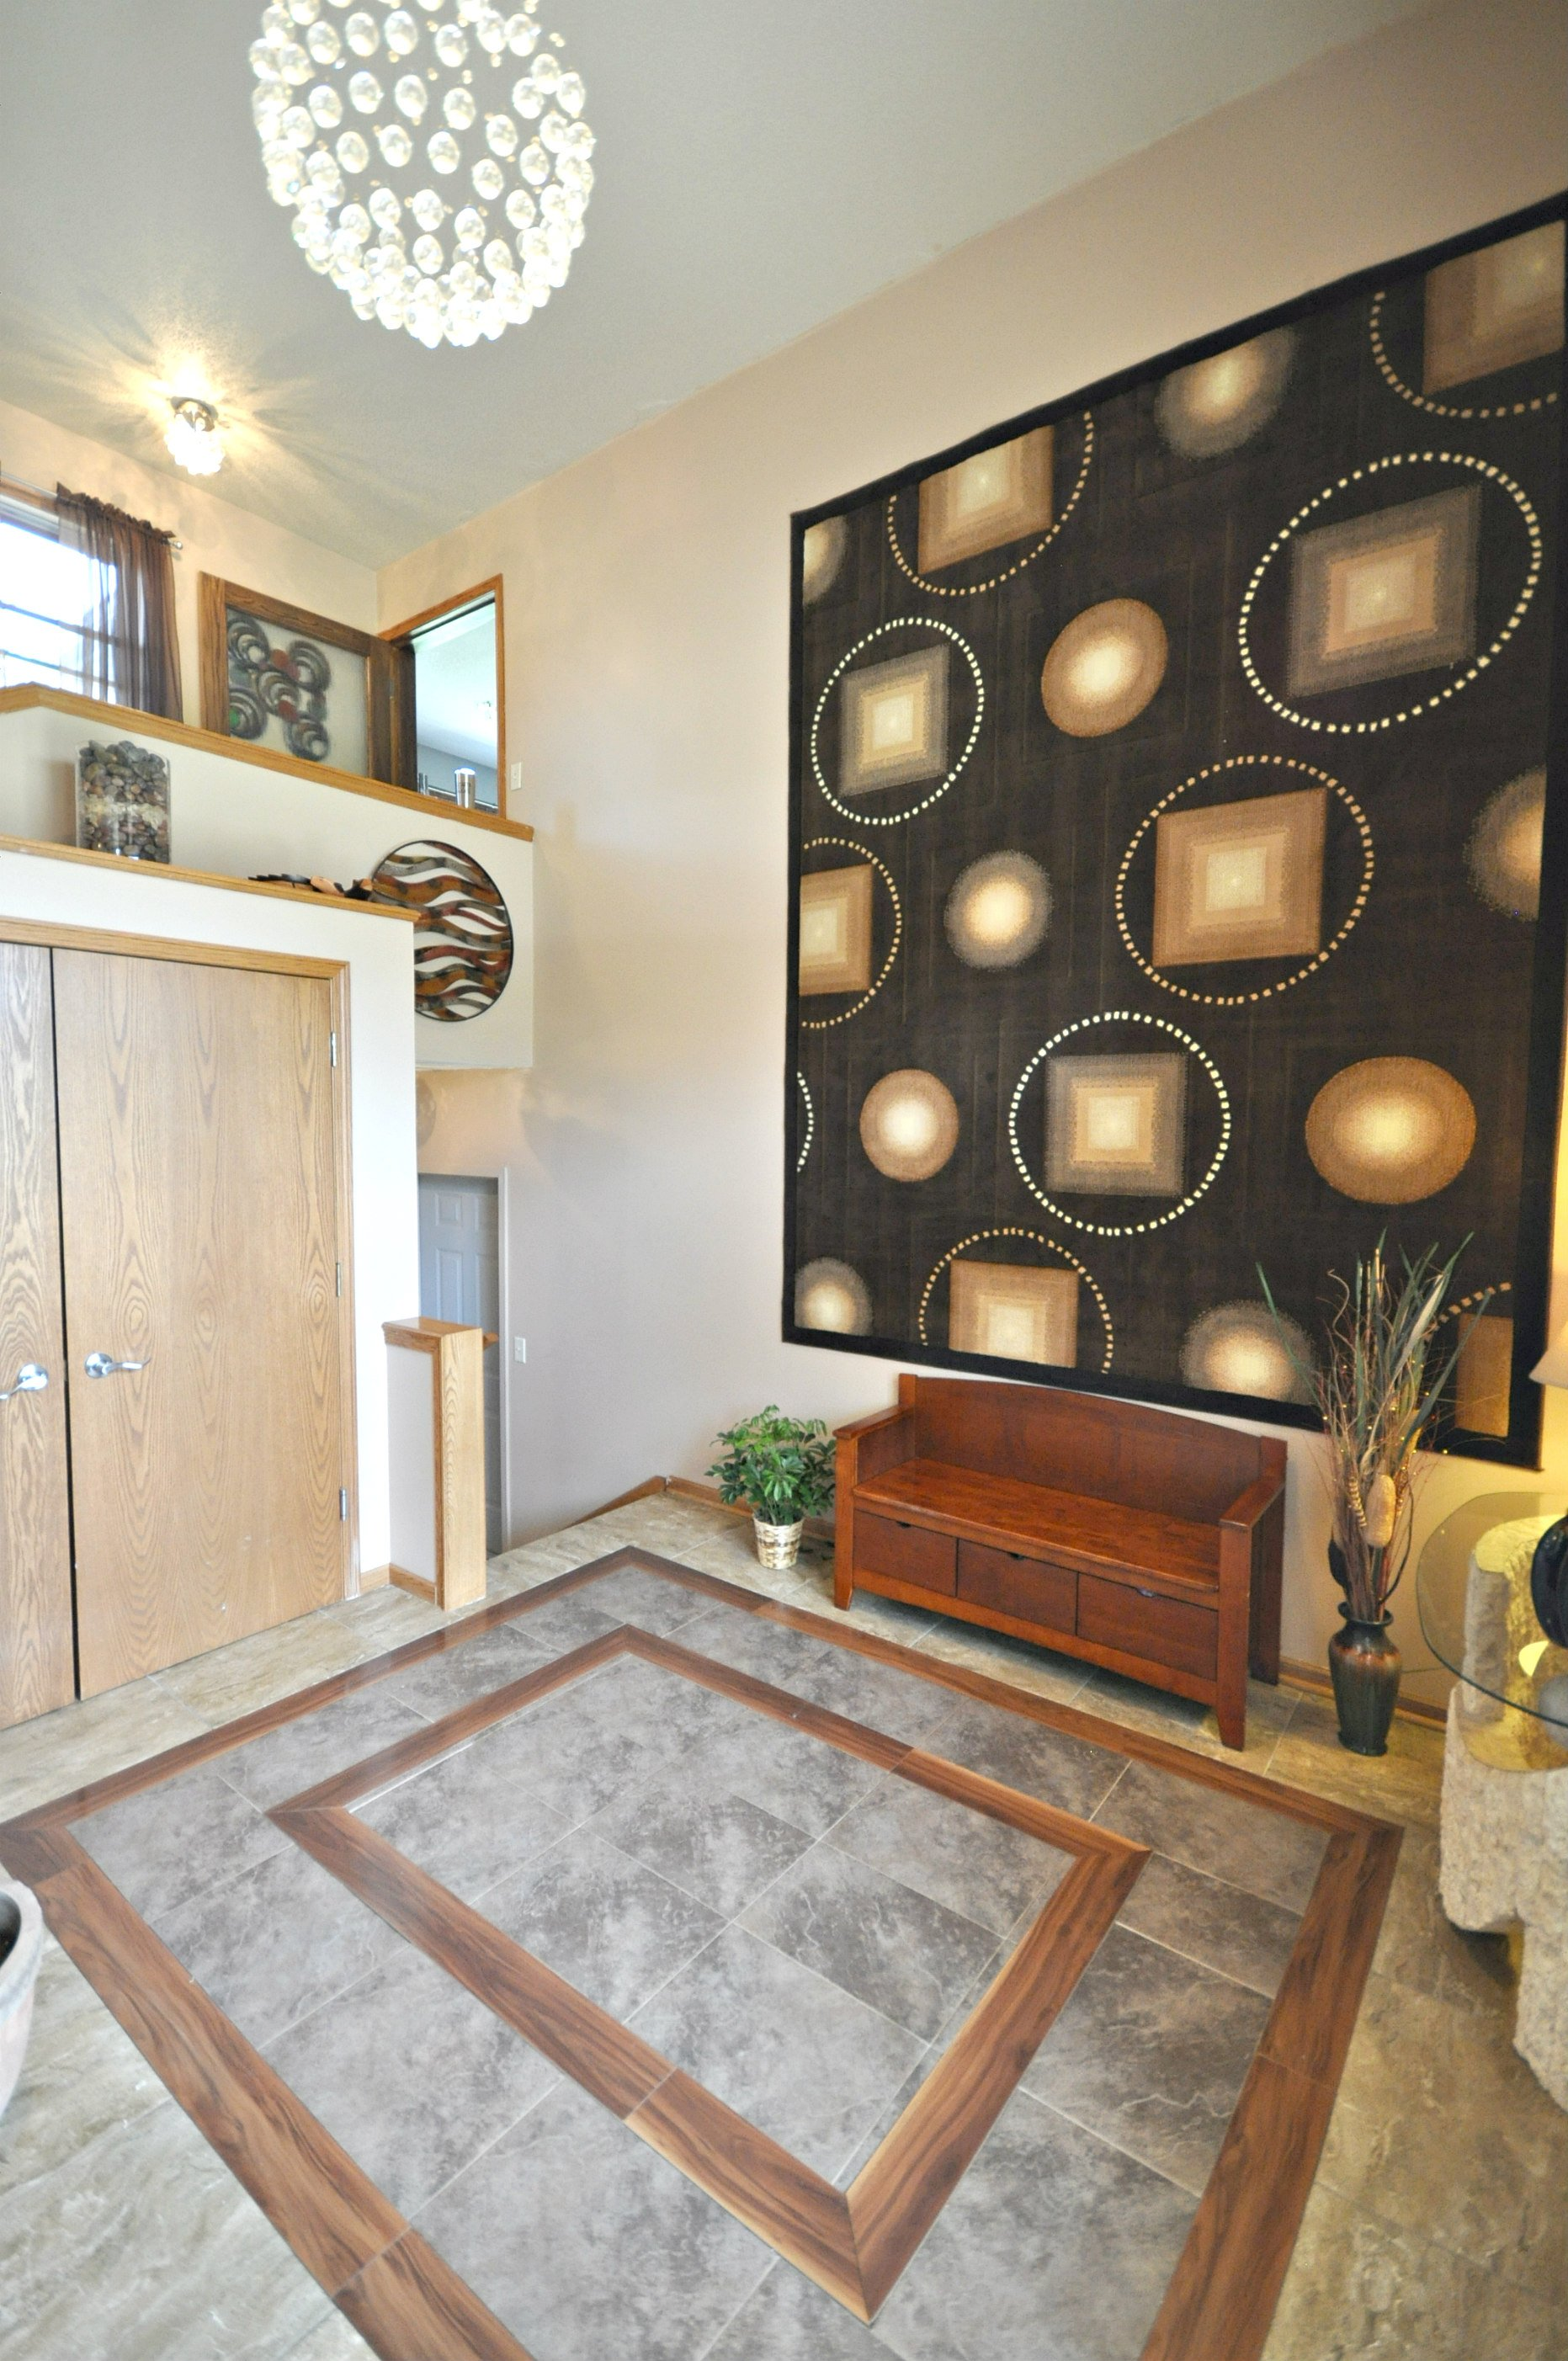 810 SW Ankeny Rd. Ankeny, IA $379,900   SALE PENDING